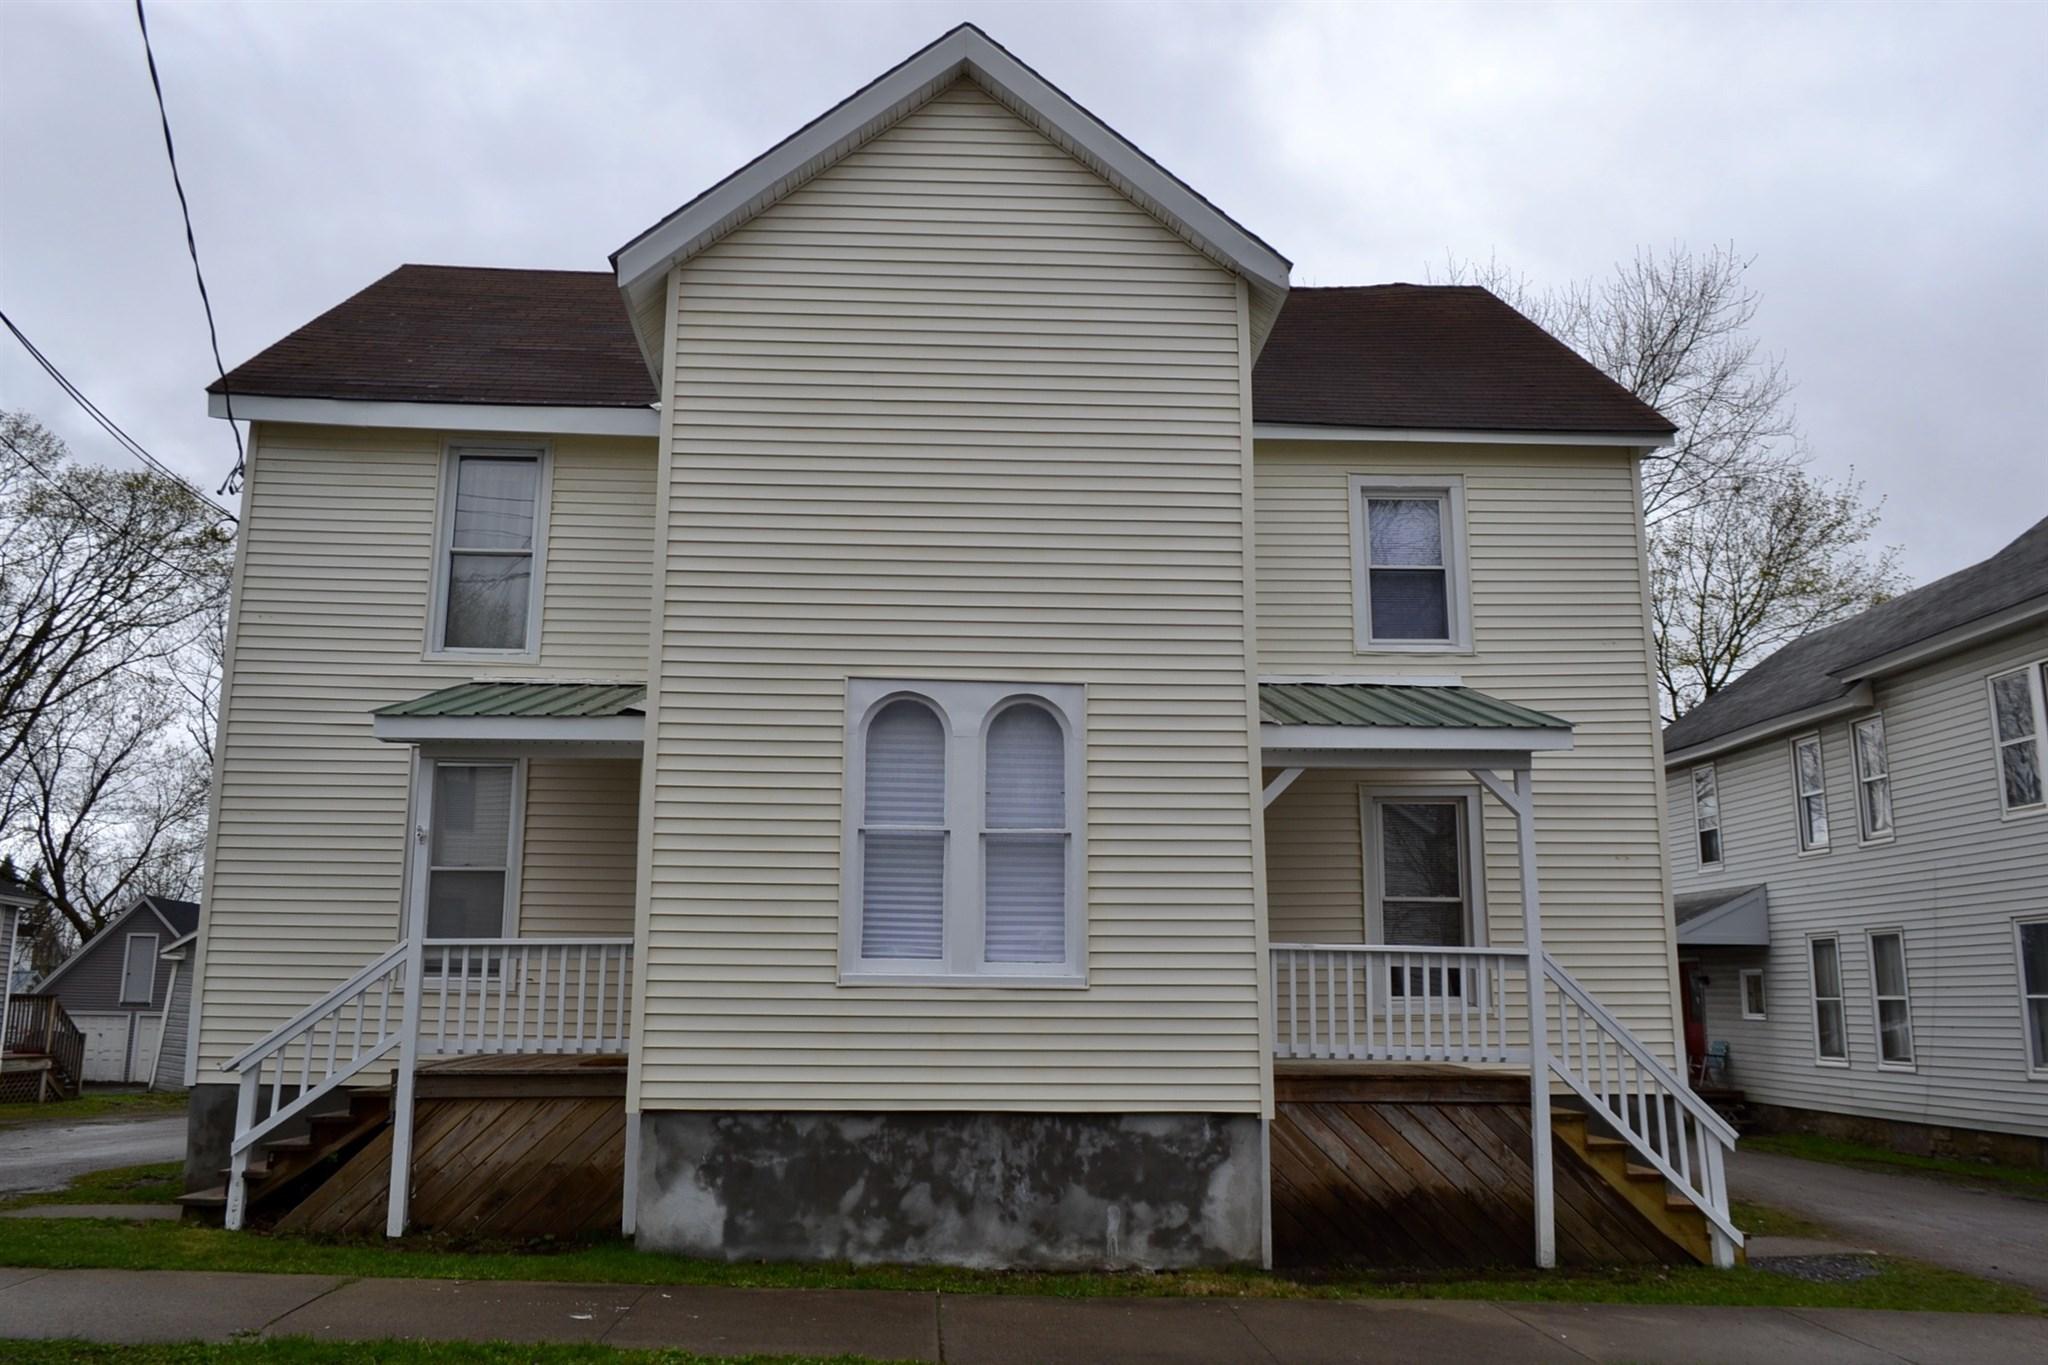 Johnstown image 39